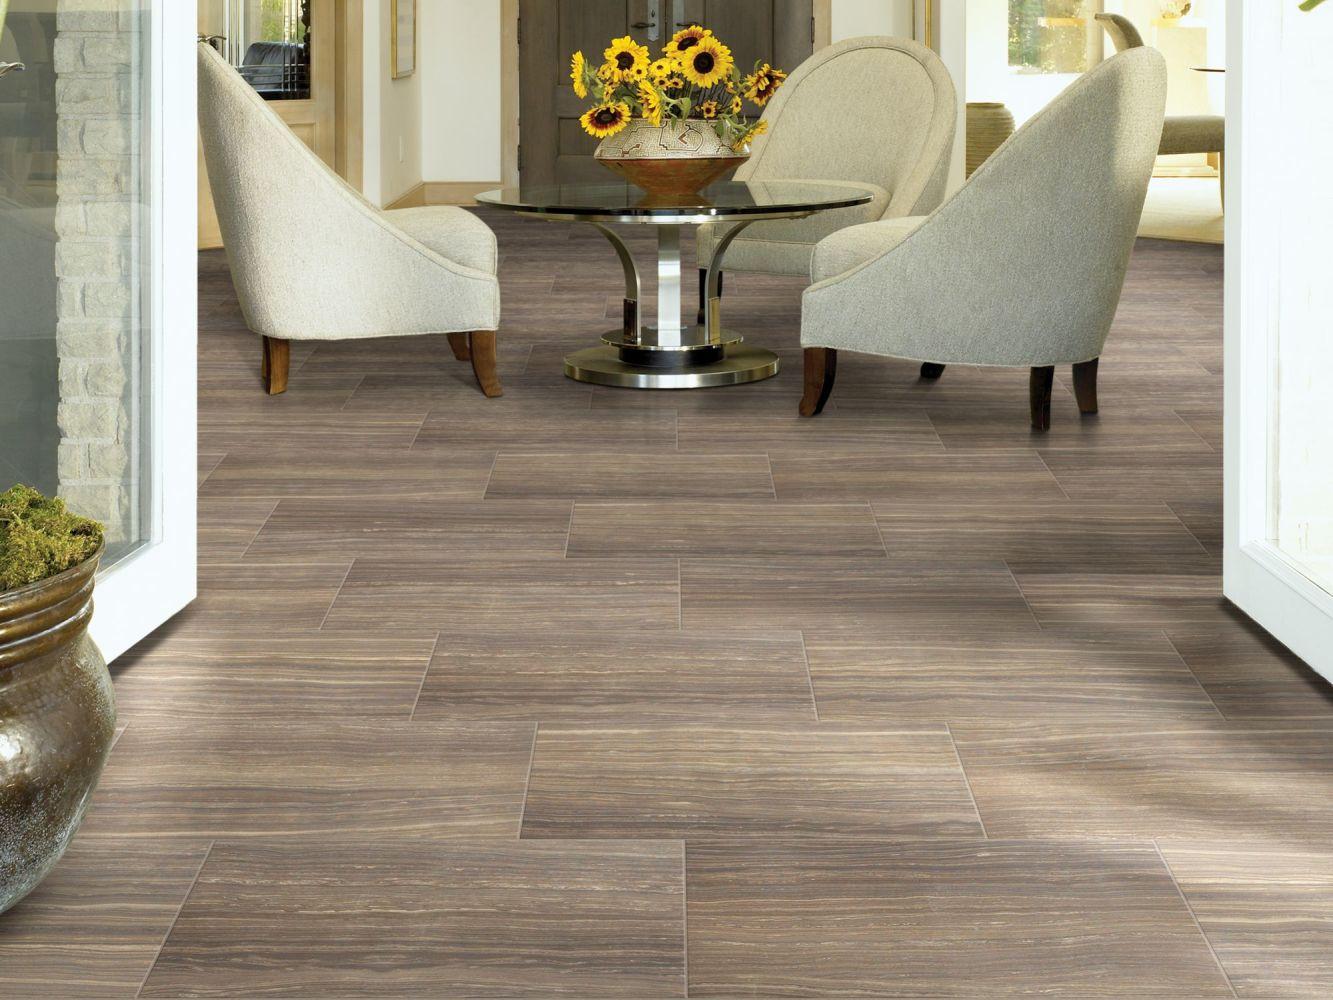 Shaw Floors Home Fn Gold Ceramic Lockport 12×24 Glade 00730_TGL99